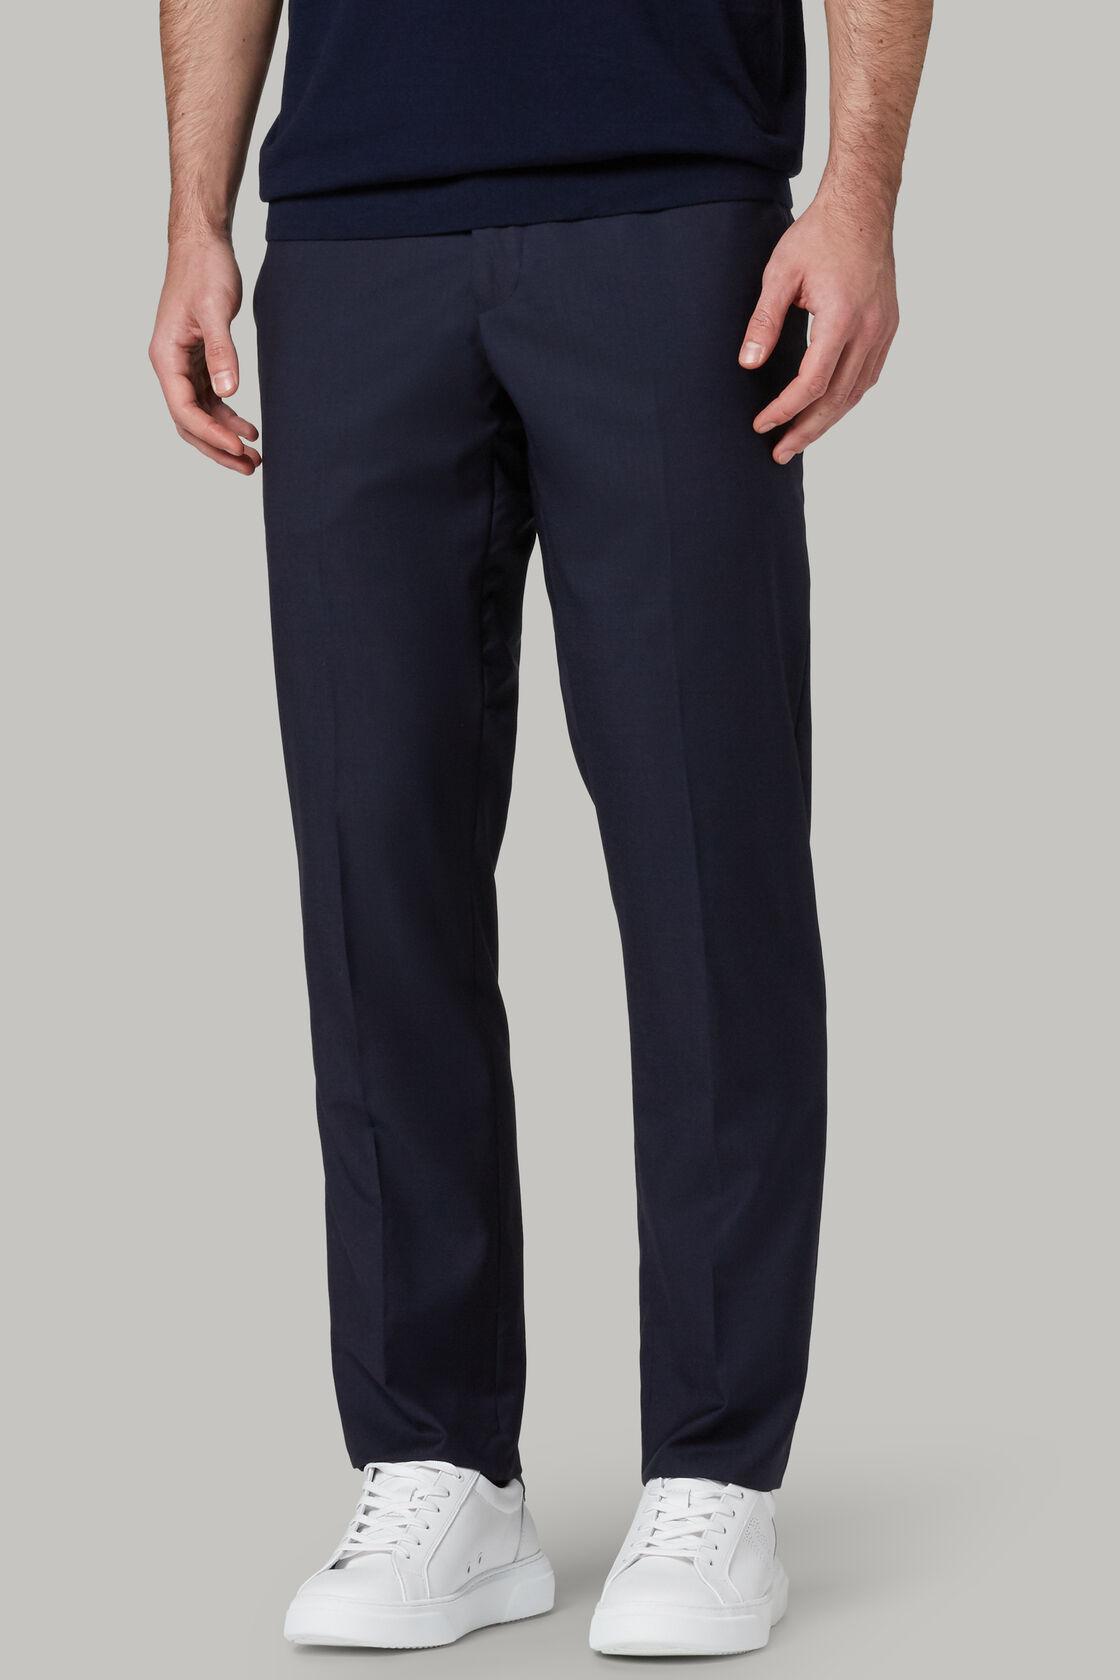 Pantalone Tinta Unita In Lana Super Leggera, , hi-res